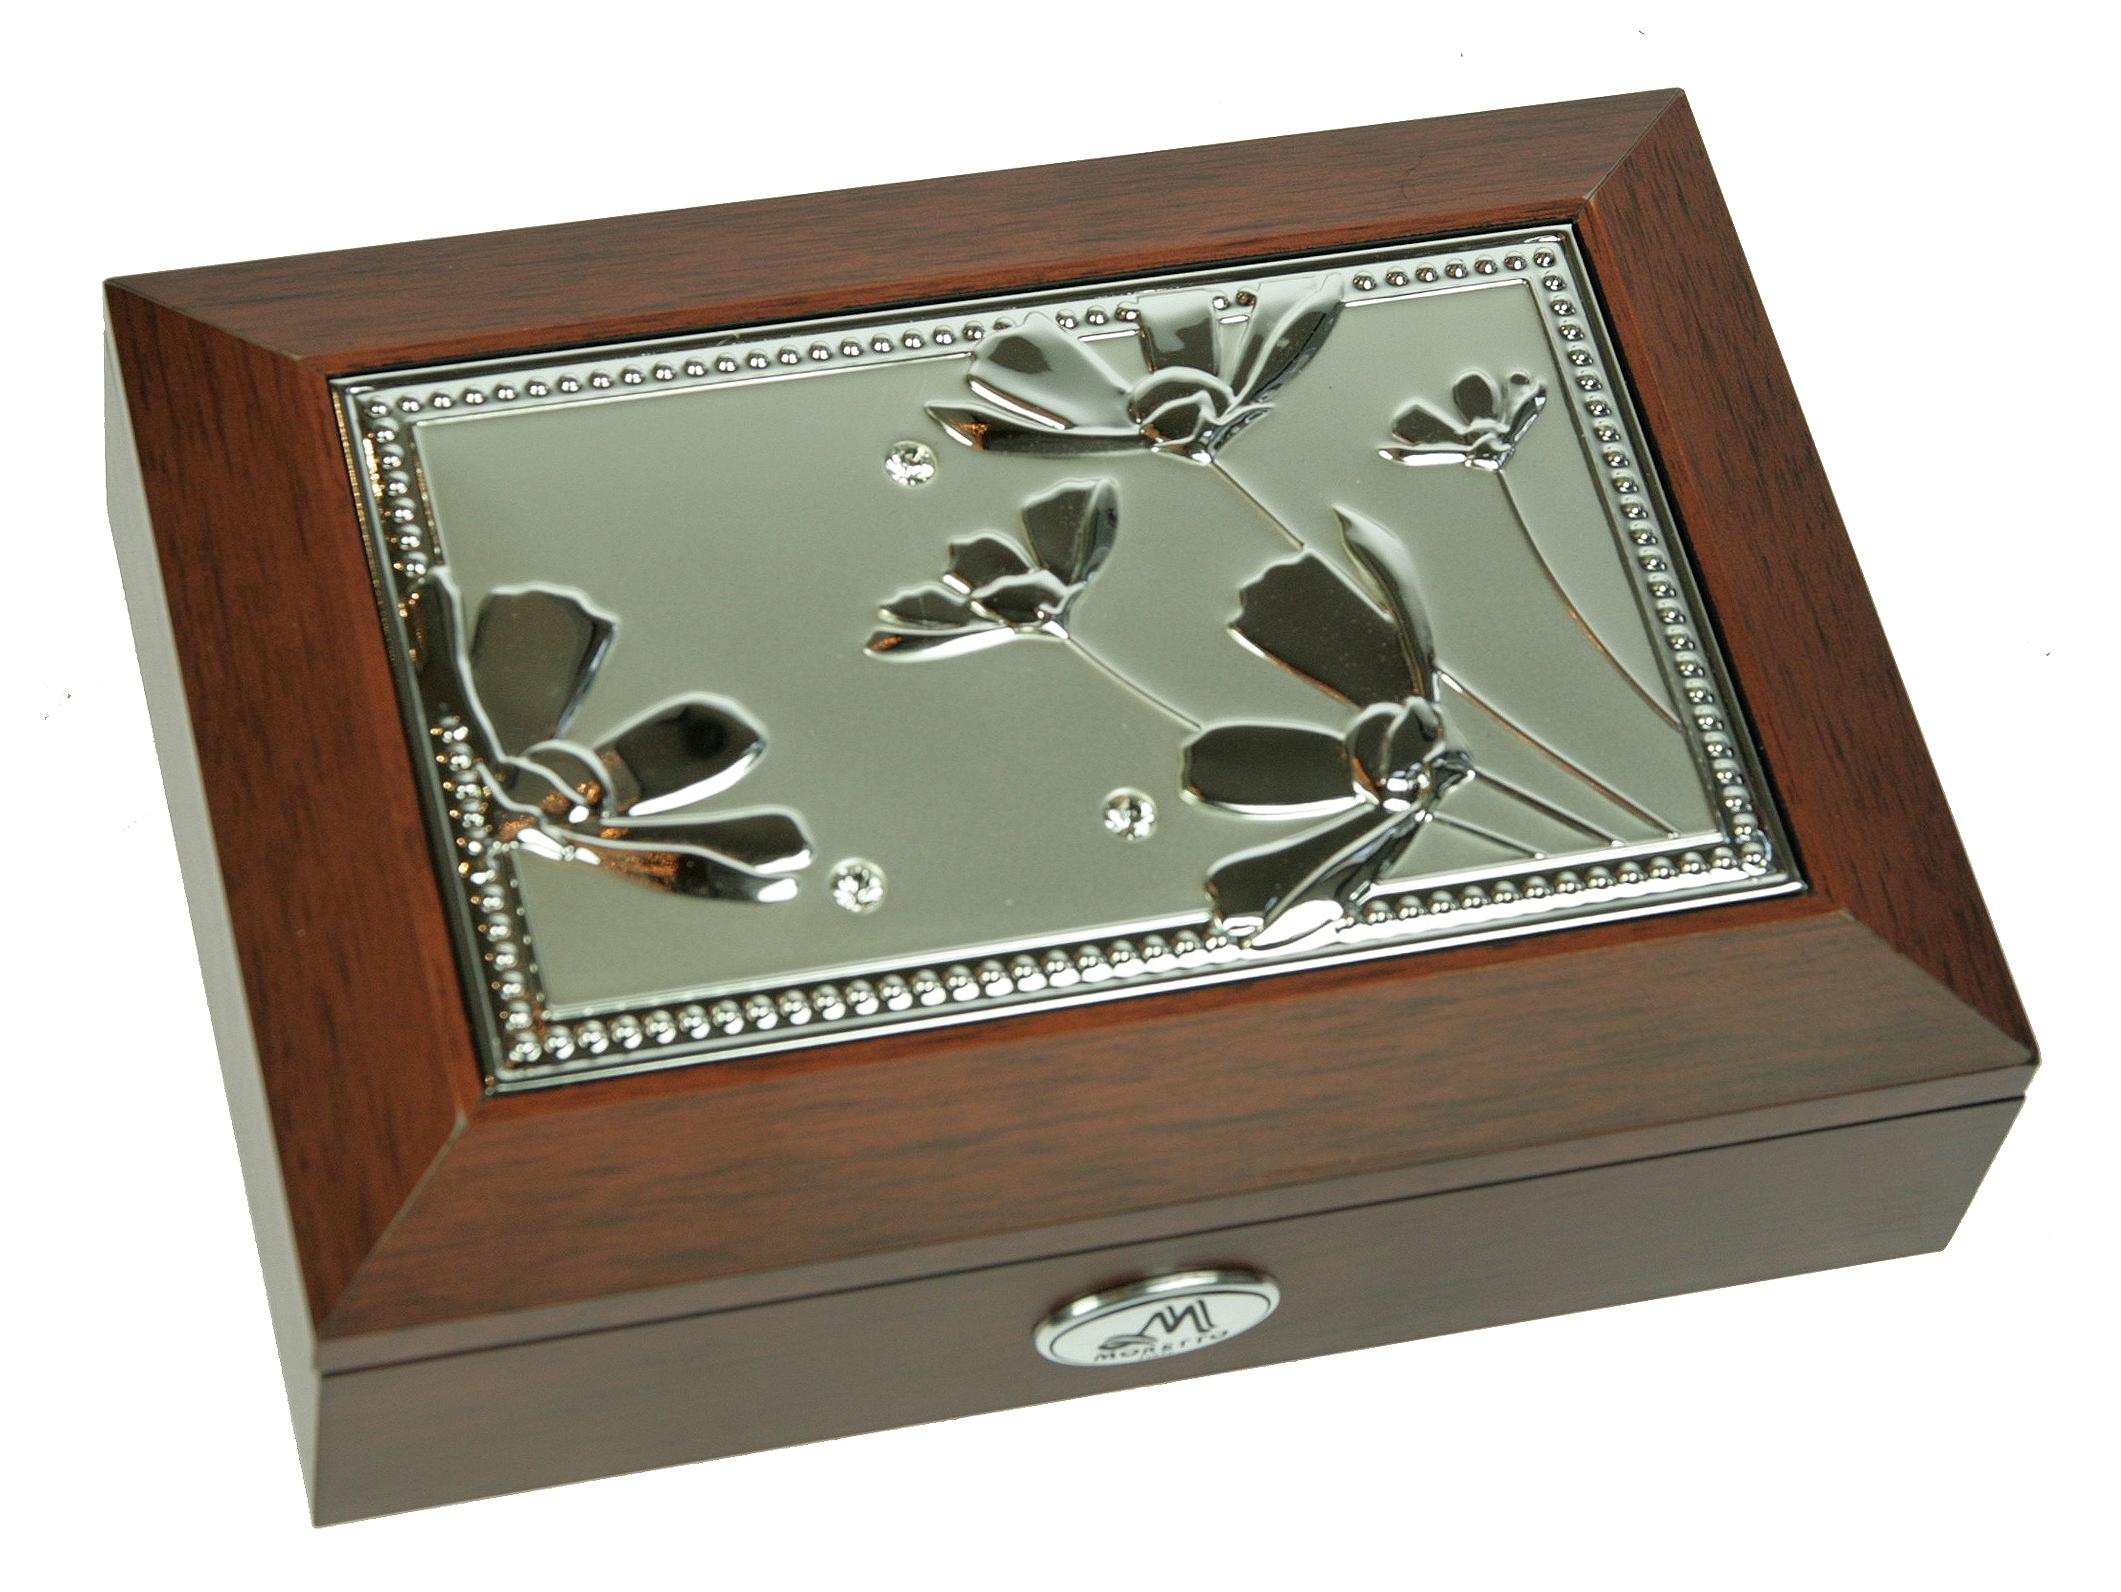 Шкатулка для ювелирных украшений Moretto, 18 х 13 х 5 см. 39850